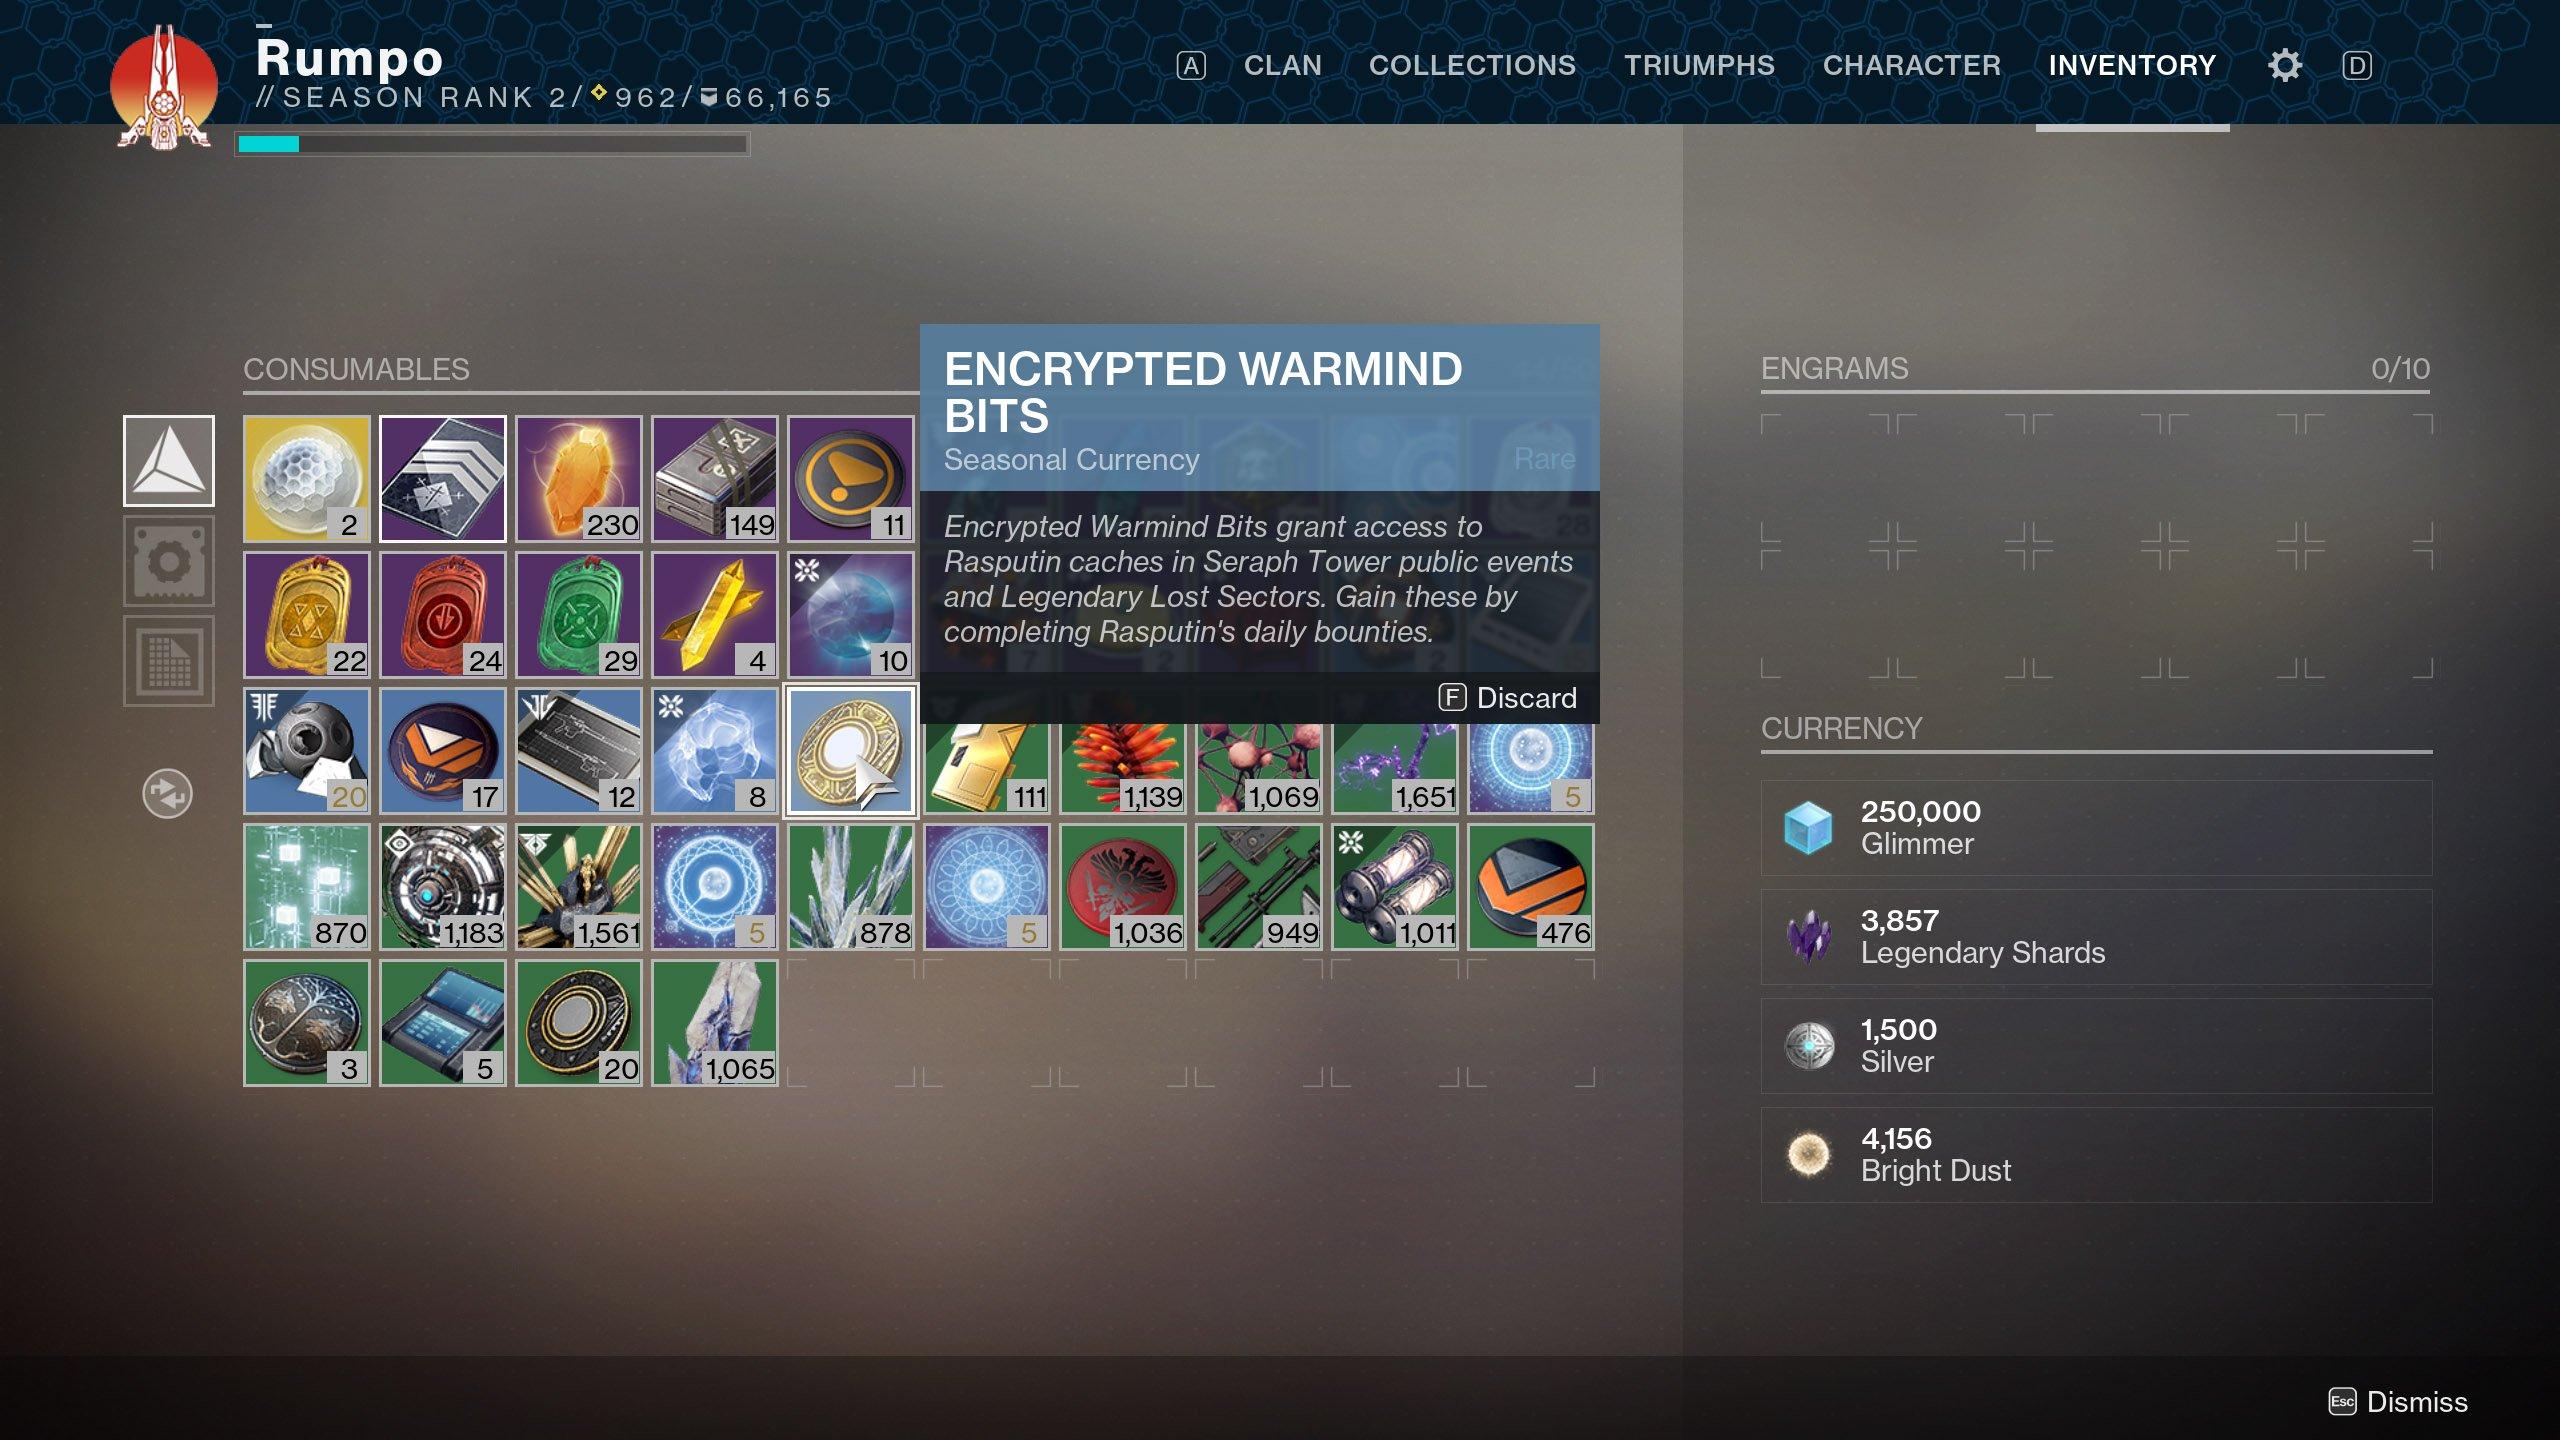 Encrypted Warmind Bits Destiny 2